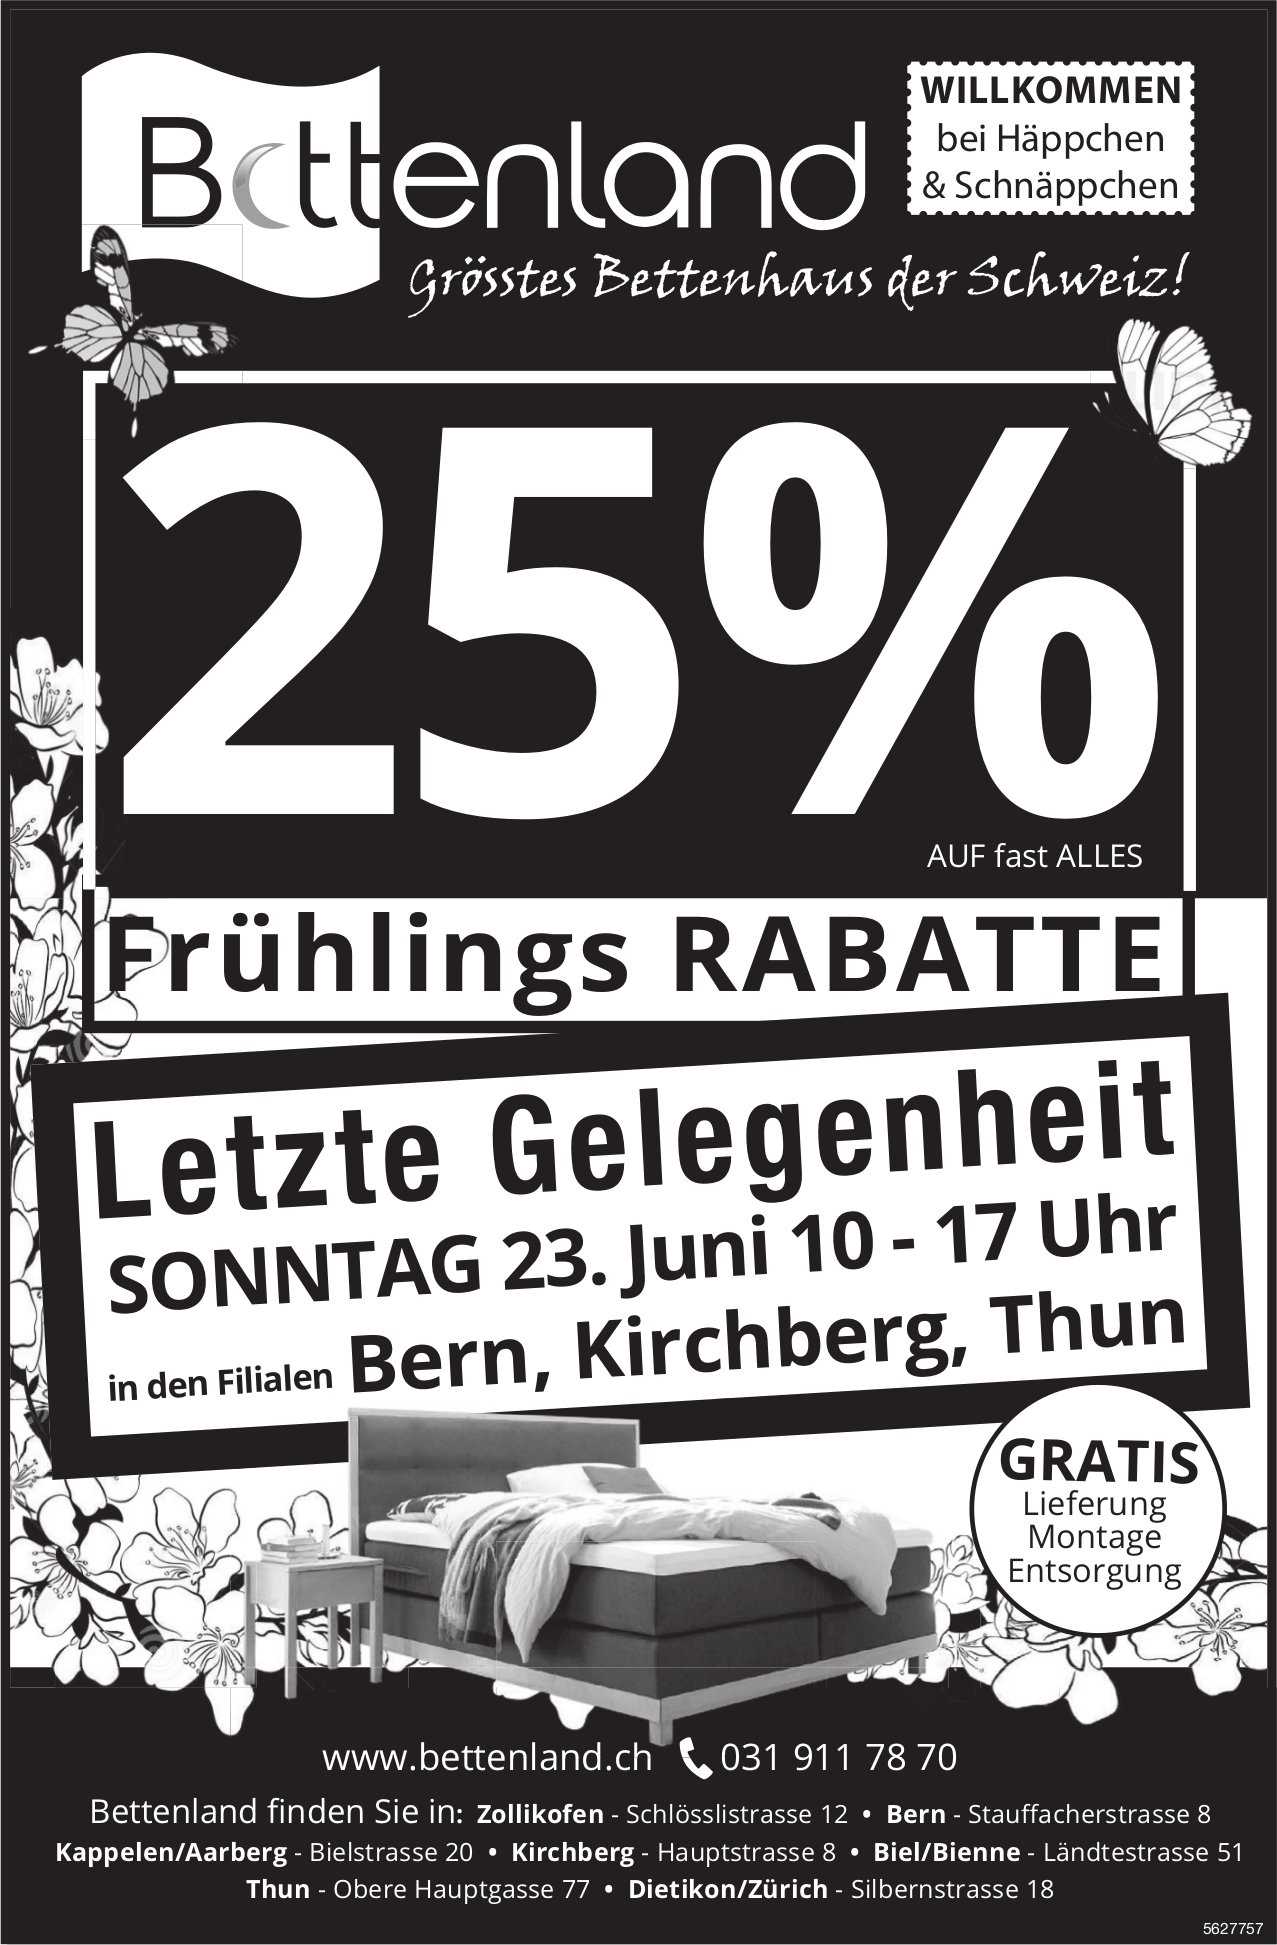 Bettenland, grösstes Bettenhaus der Schweiz! 25% Frühlings Rabatte / Letzte Gelegenheit 23. Juni